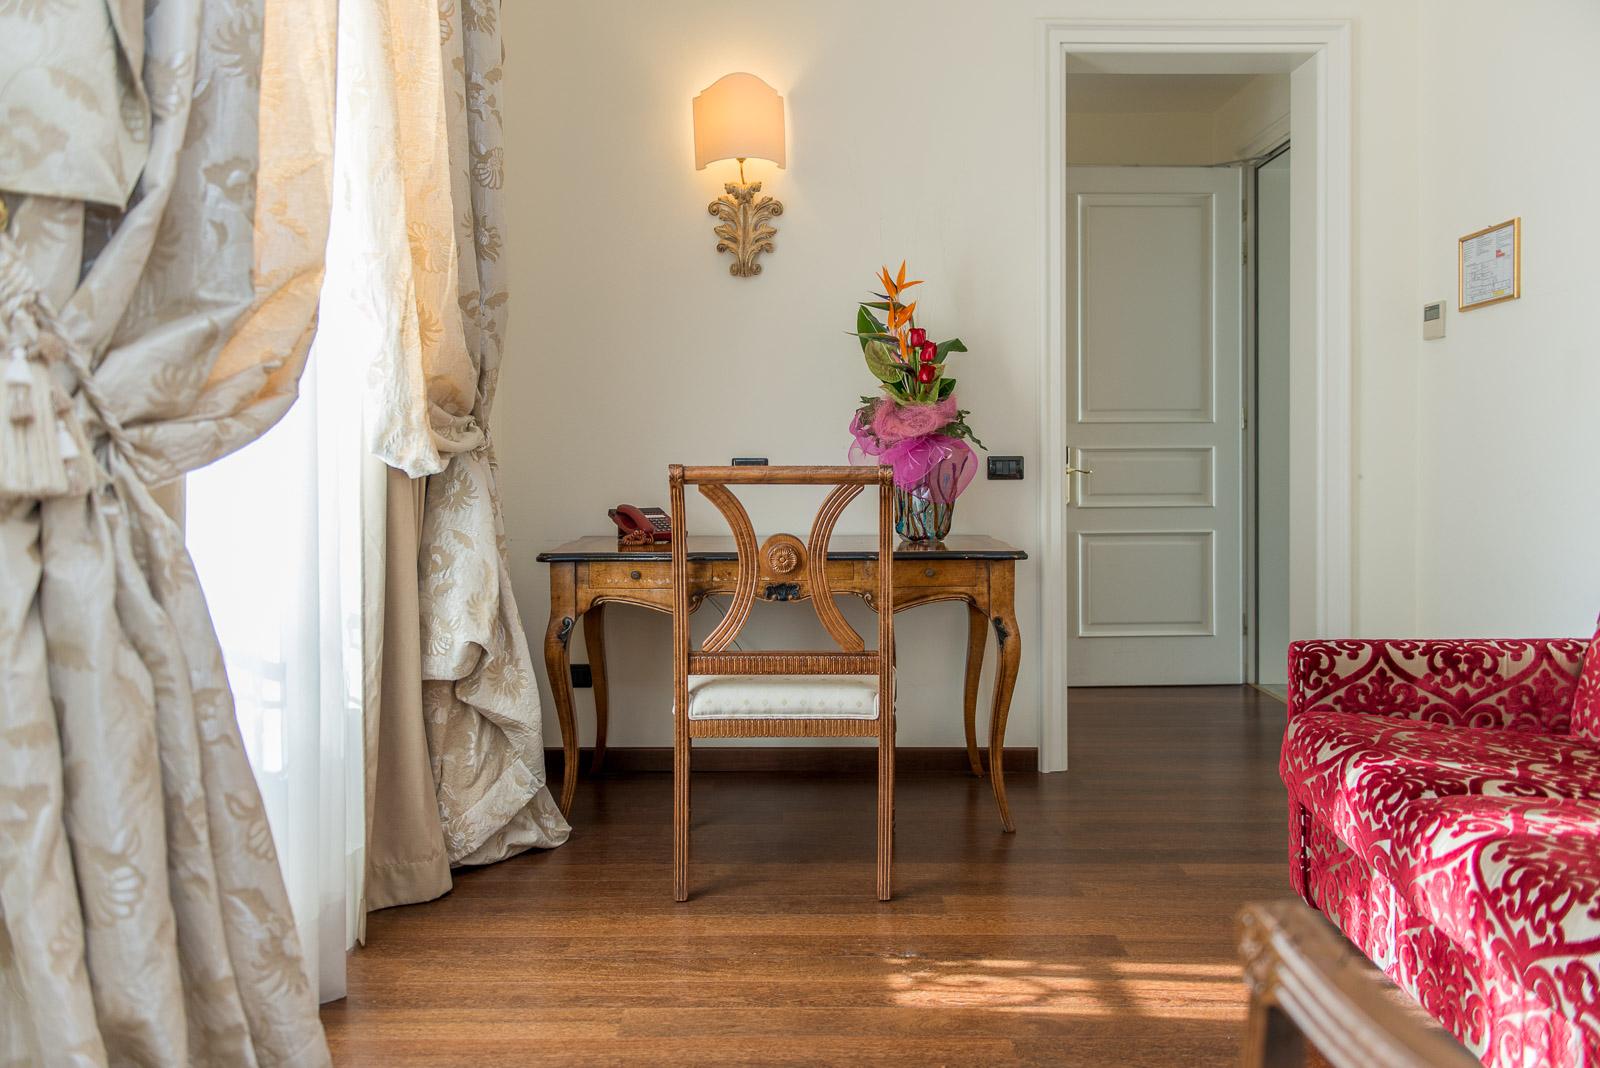 https://www.orlandinifrancesco.com/wp/wp-content/uploads/2018/09/Grand-Hotel-Lecce-5.jpg